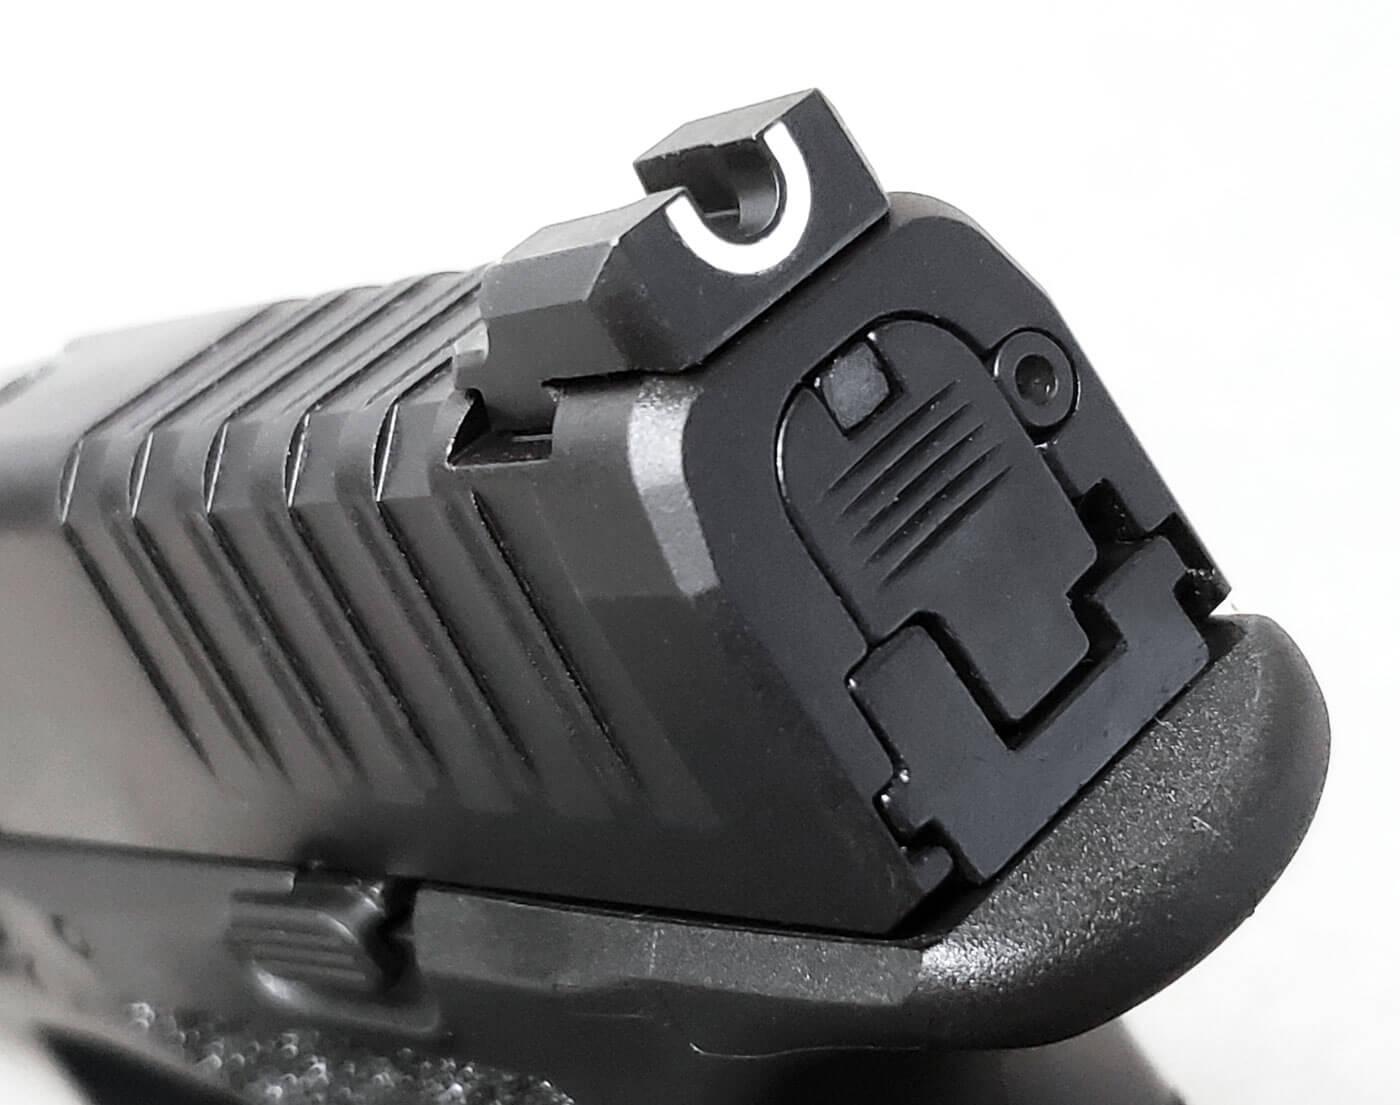 Springfield's factory sights uses a u-notch rear sight